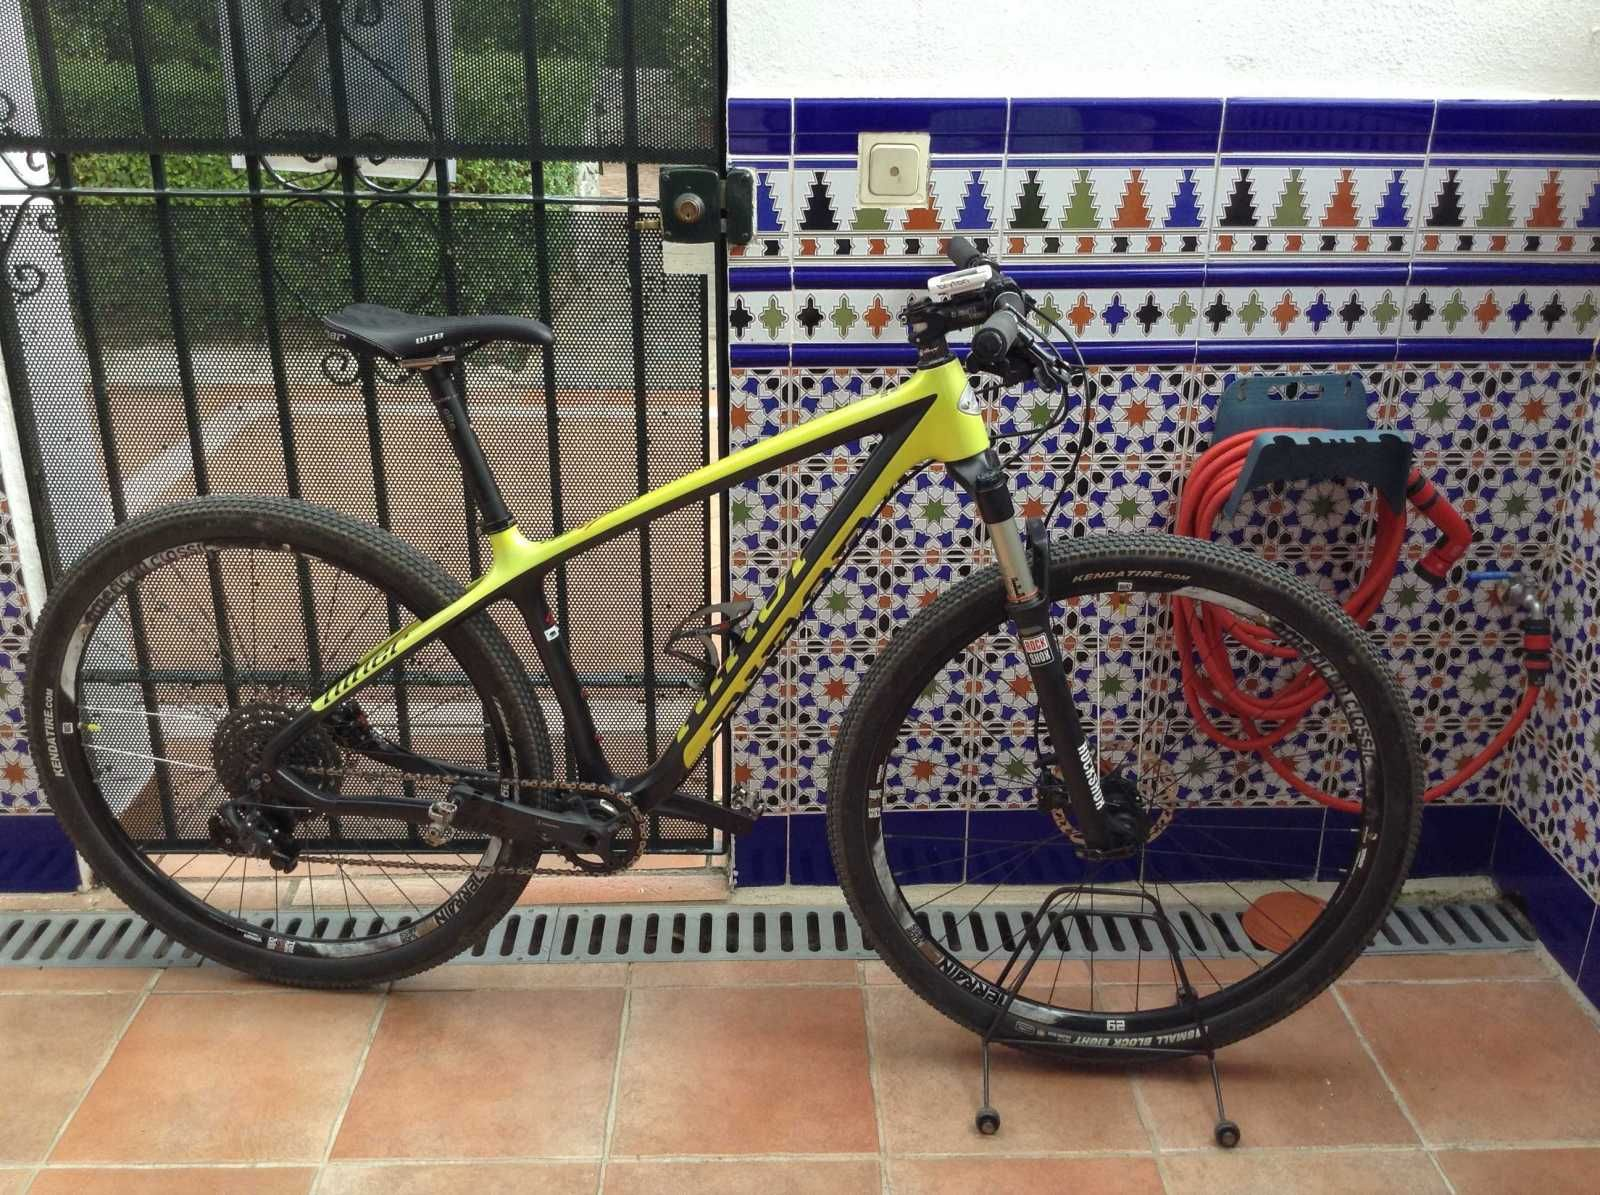 Niner AIR 9 RDO Side Profile Touring bike